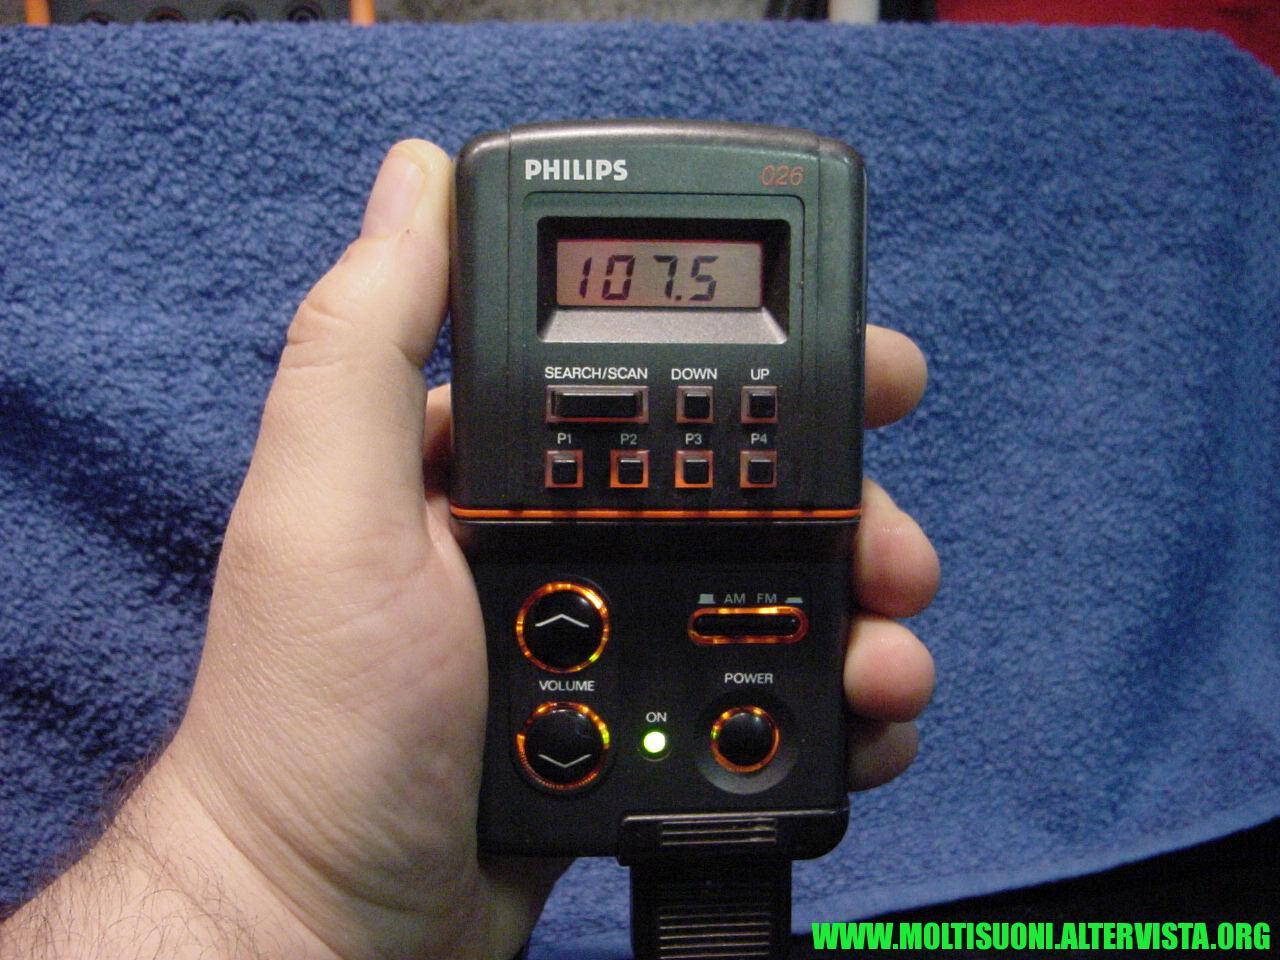 Philips split radio DC 026 - moltisuoni 1